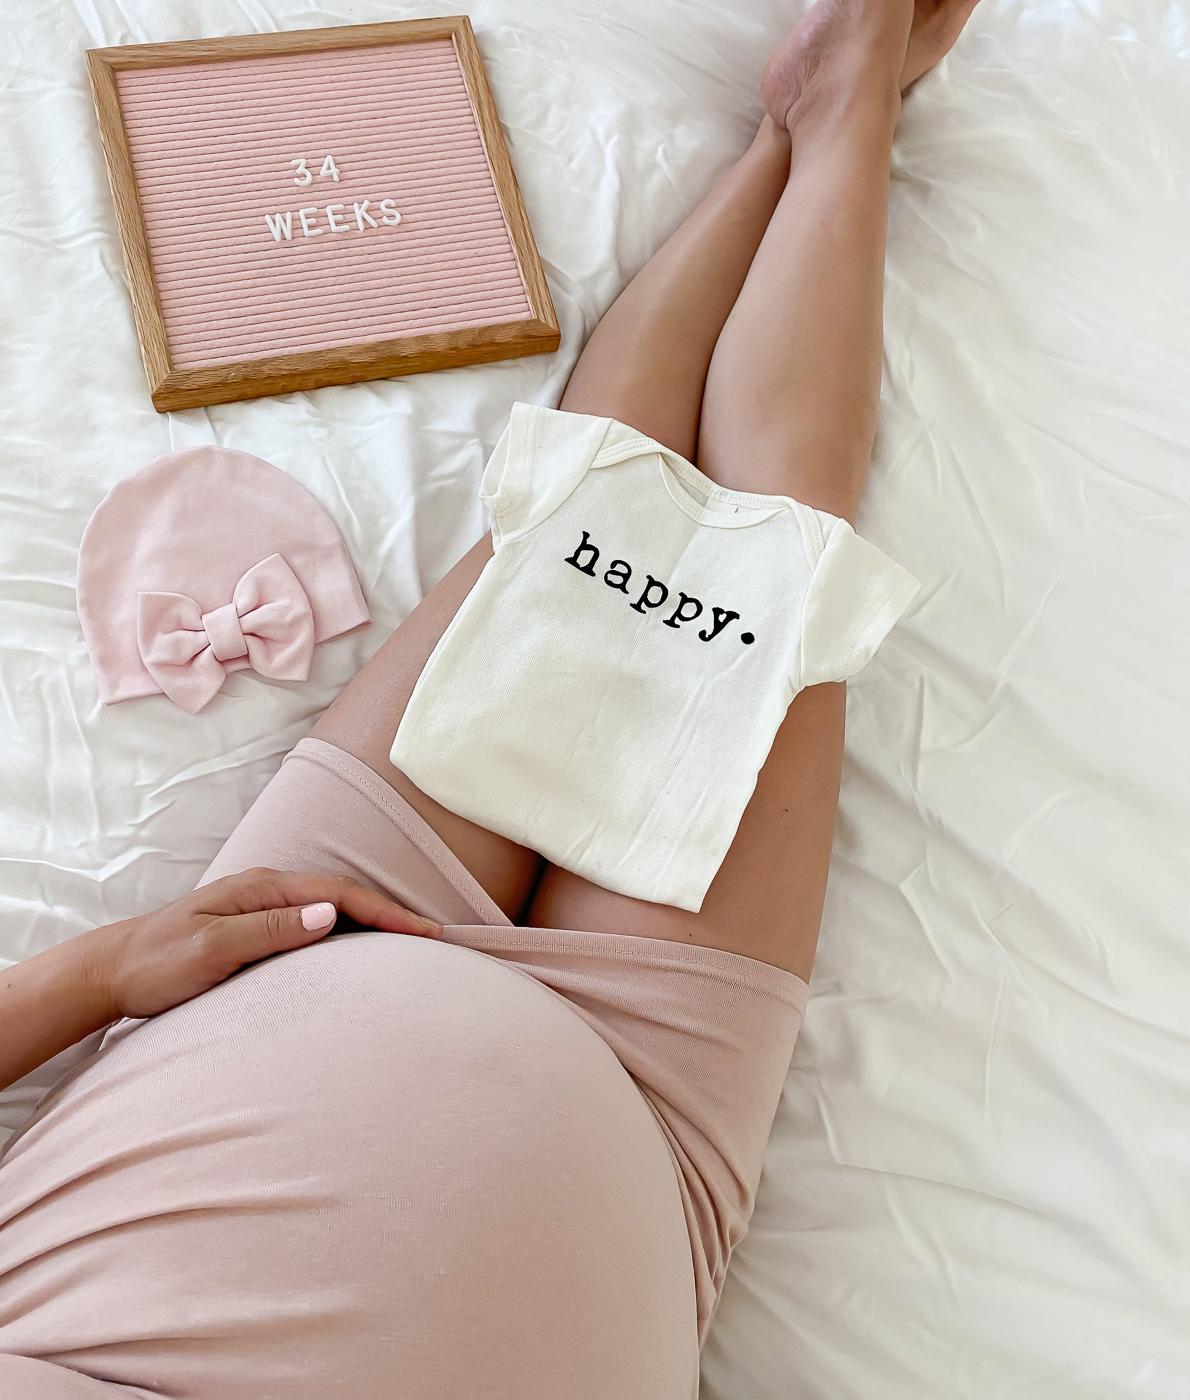 34 weeks pregnancy baby bump letter board organic happy onsie pink bow hat